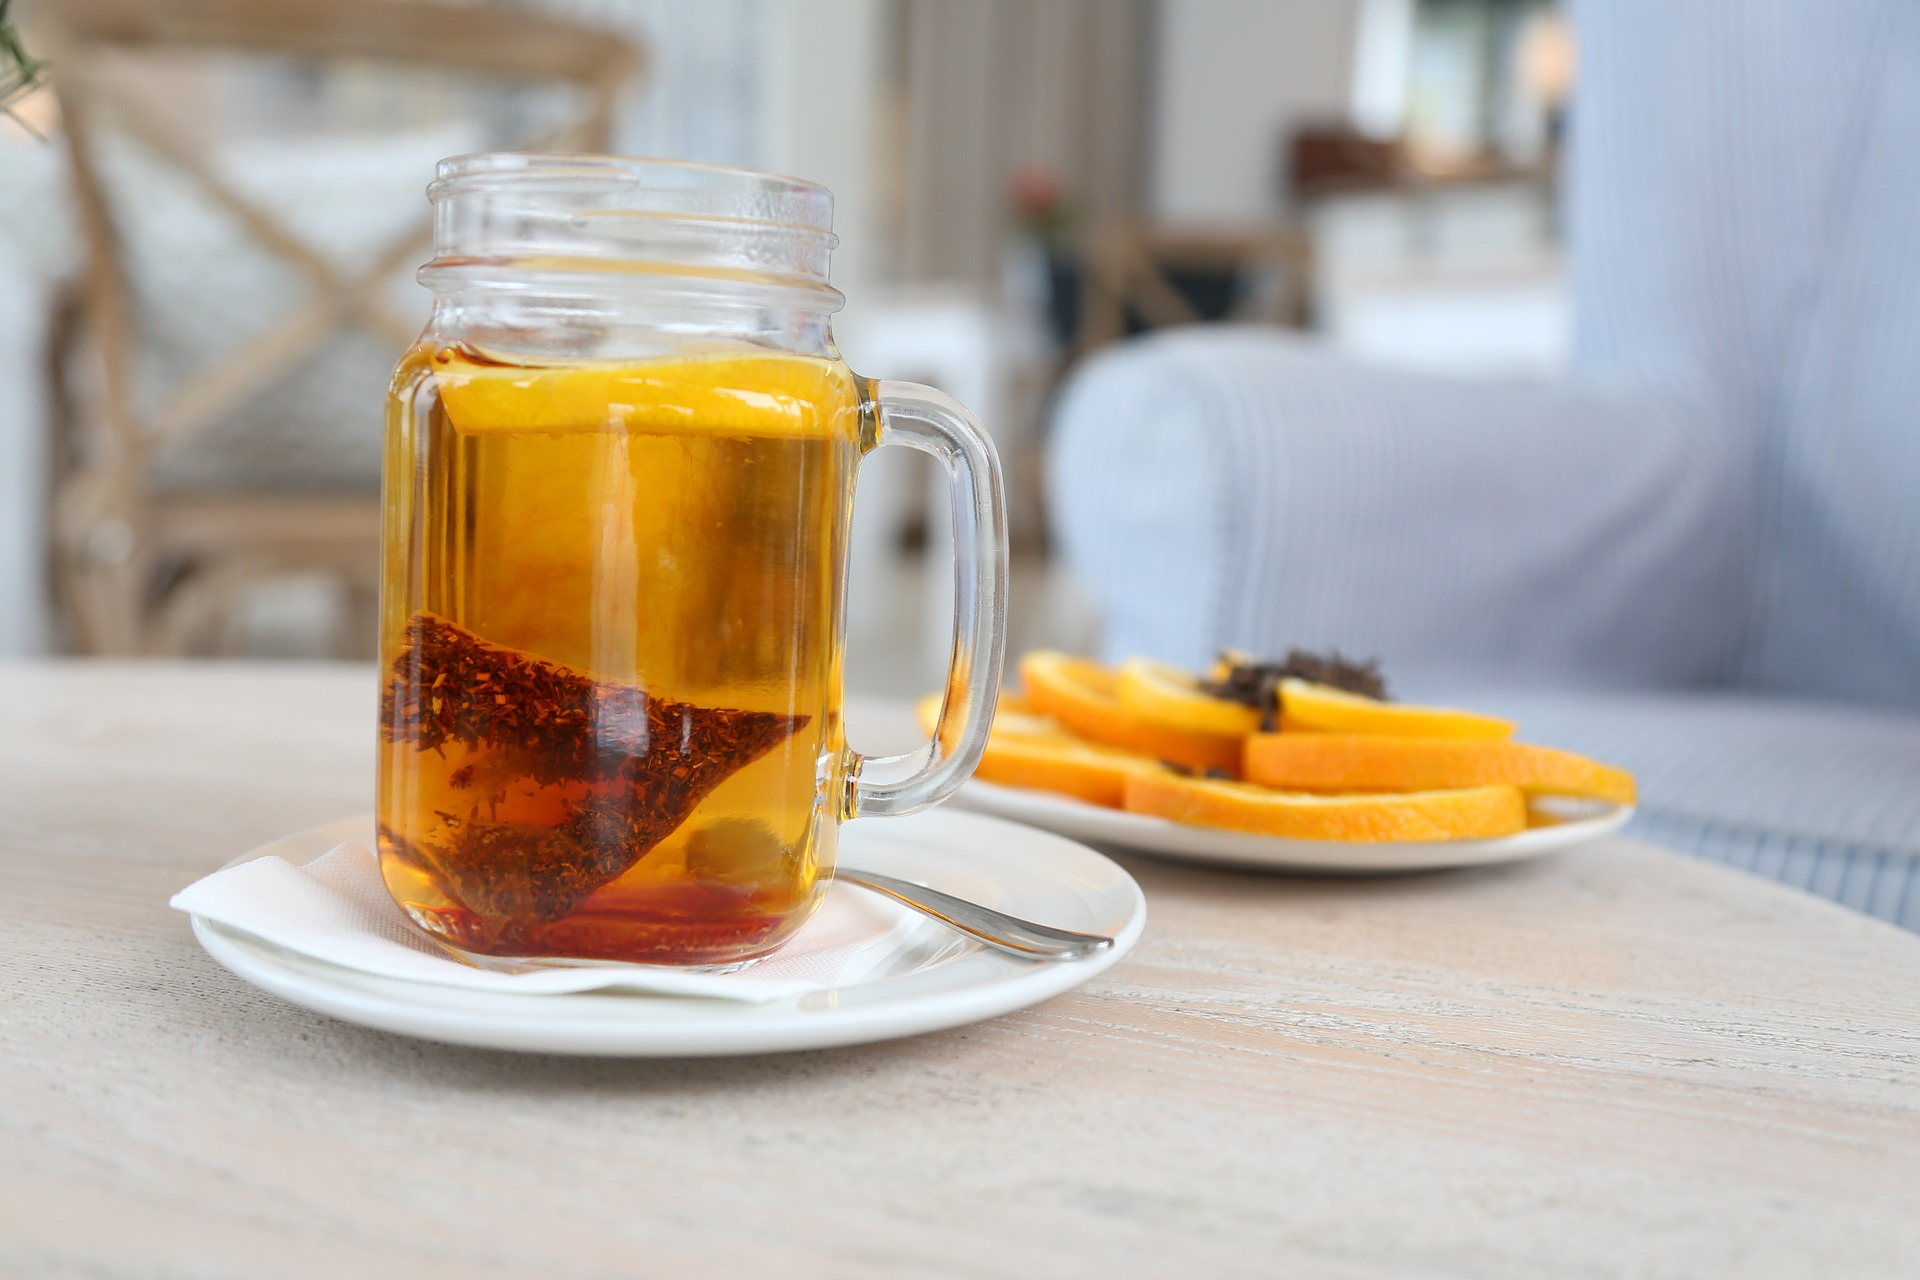 czerwona herbata rooibos, rooibos, rooibos parzenie, czerwona herbata, afrykańska herbata, herbata afrykańska, herbata z afryki